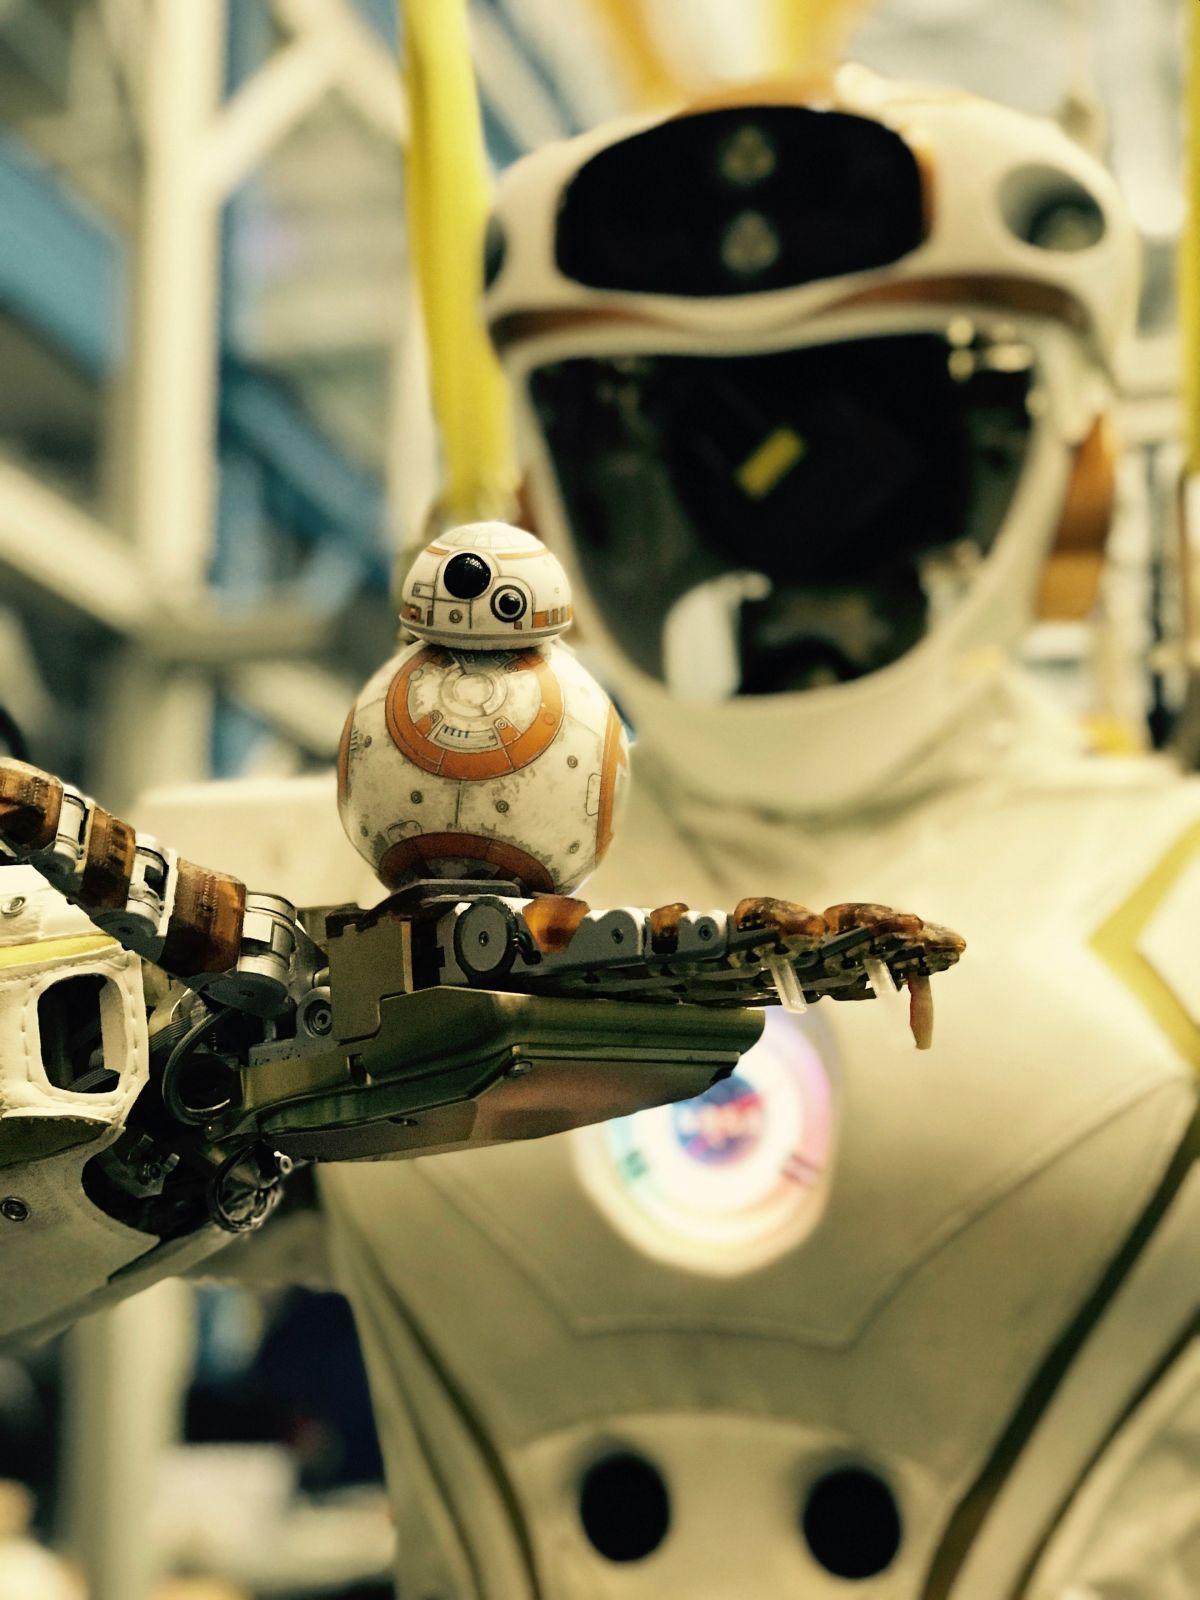 39 star wars 39 droids point the way to nasa repair robots space - Robot blanc star wars ...